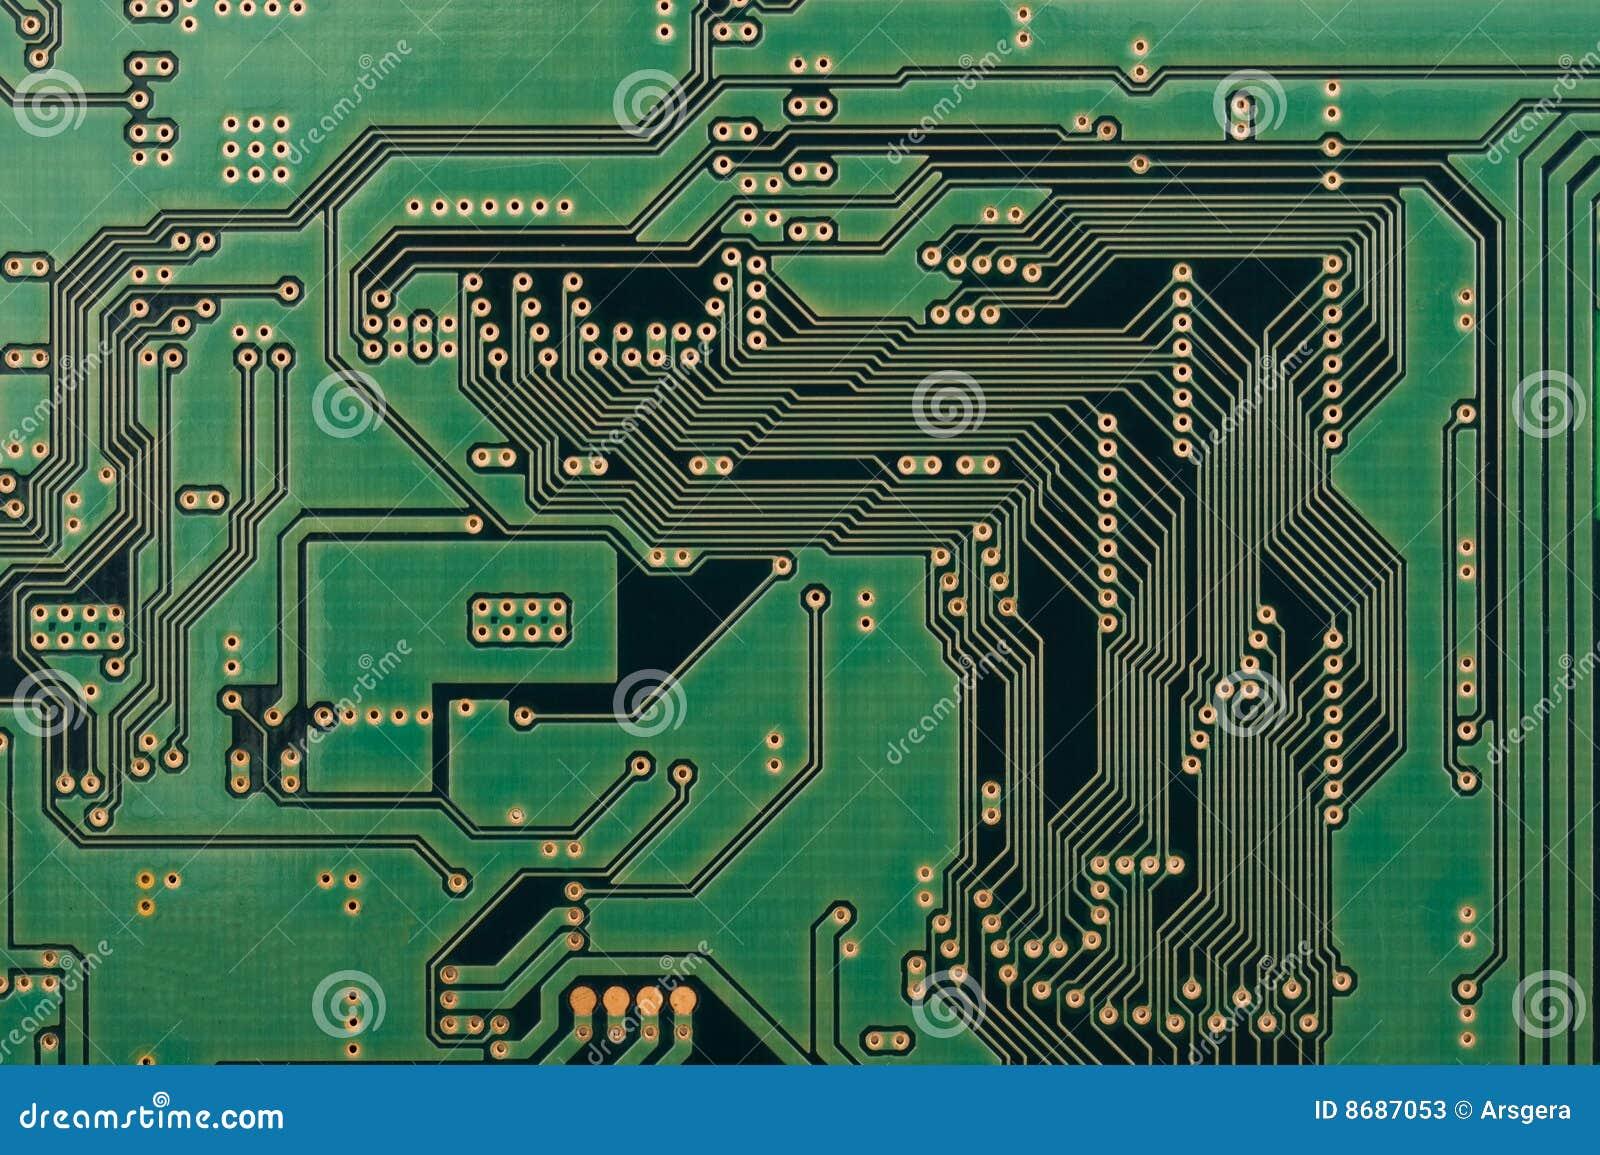 Circuito Z : Circuito integrado imagem de stock placa